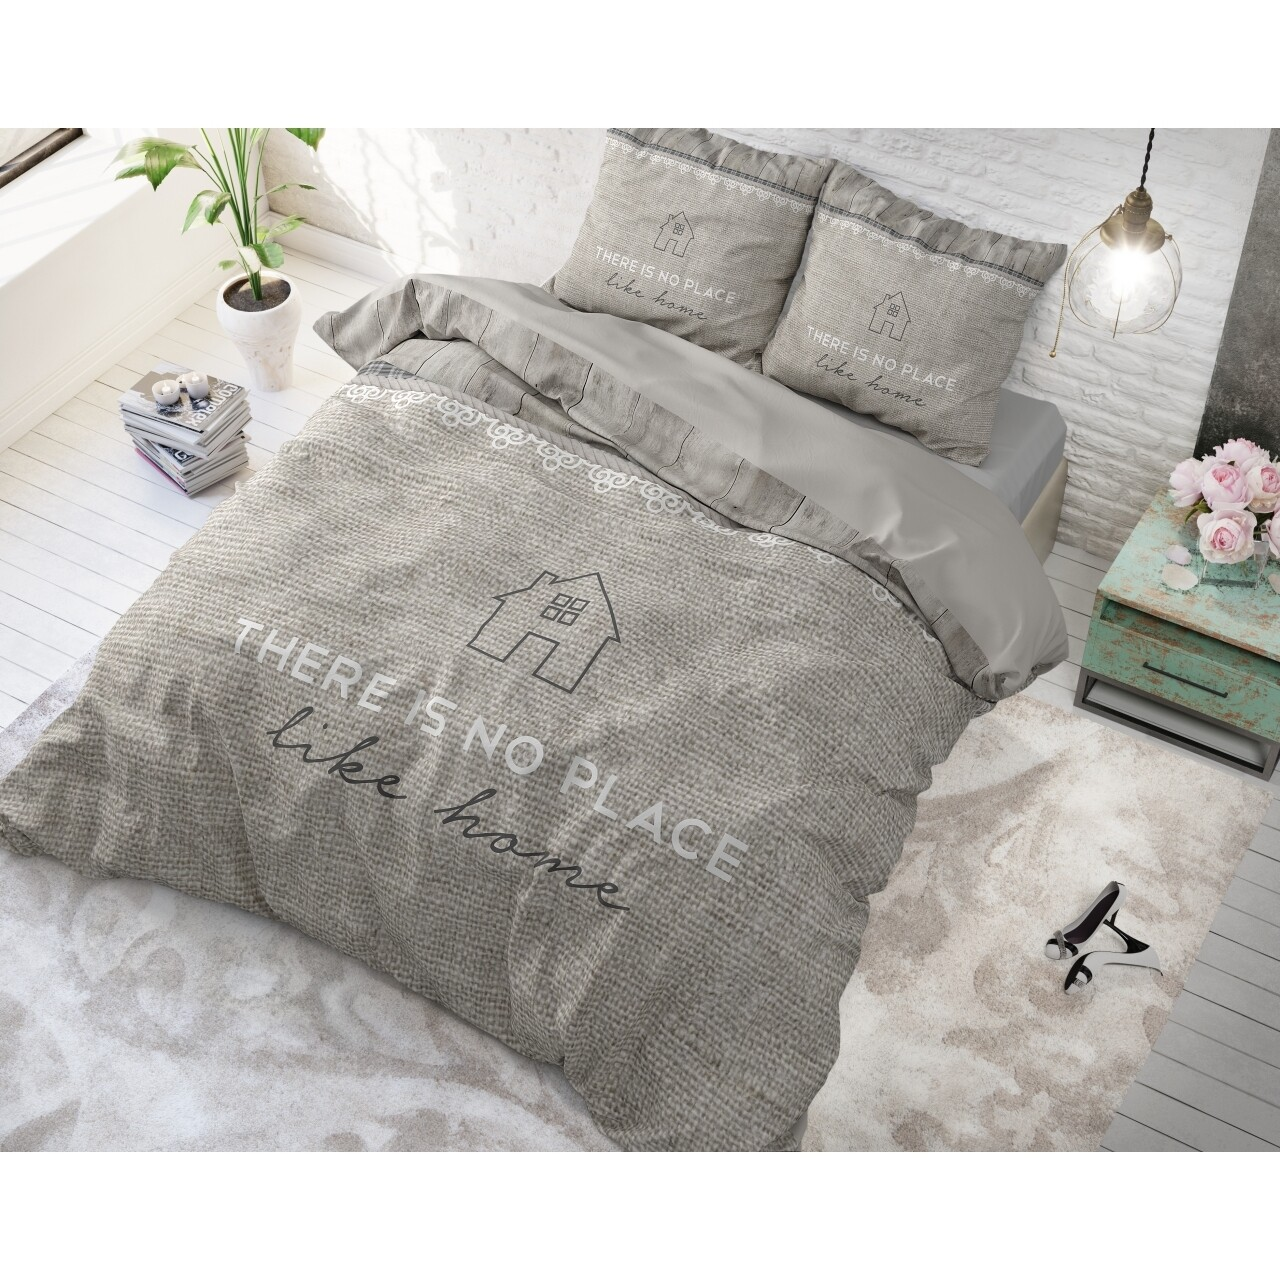 Lenjerie de pat pentru doua persoane Like Home Taupe, Royal Textile, 100% bumbac